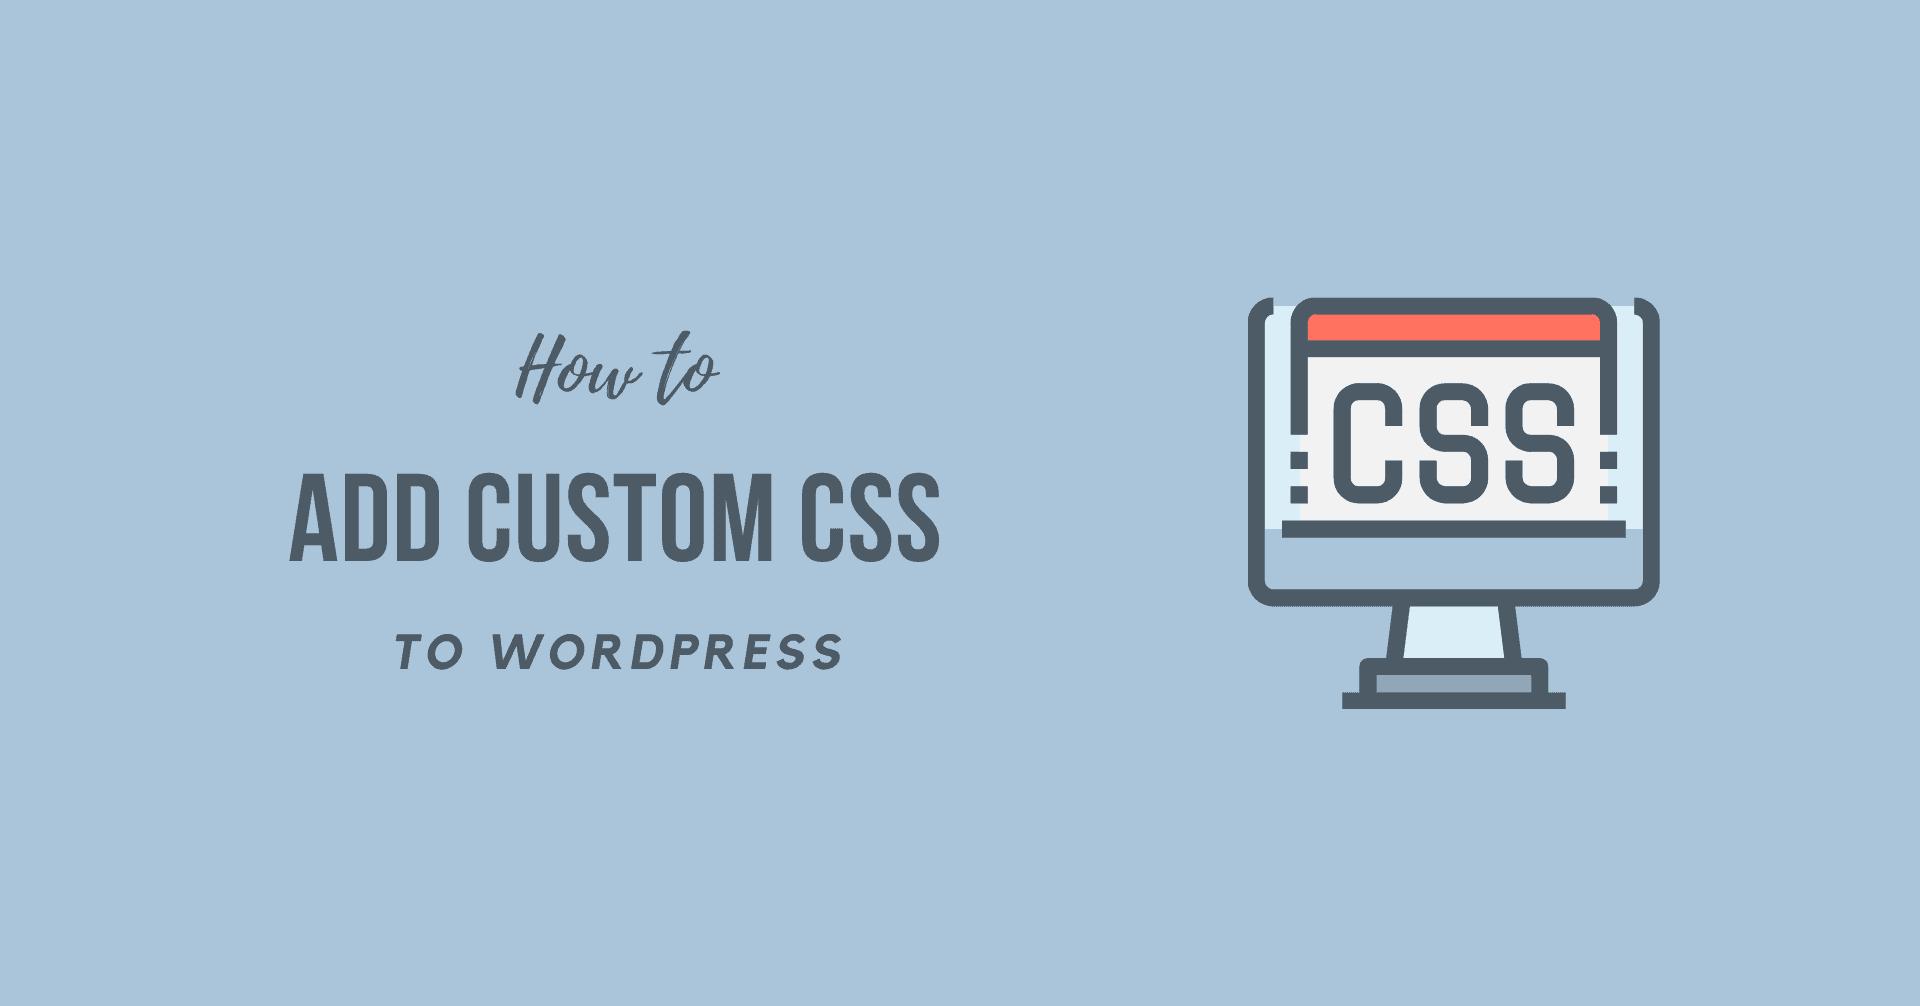 How to Add Custom CSS to WordPress 2021 Easily